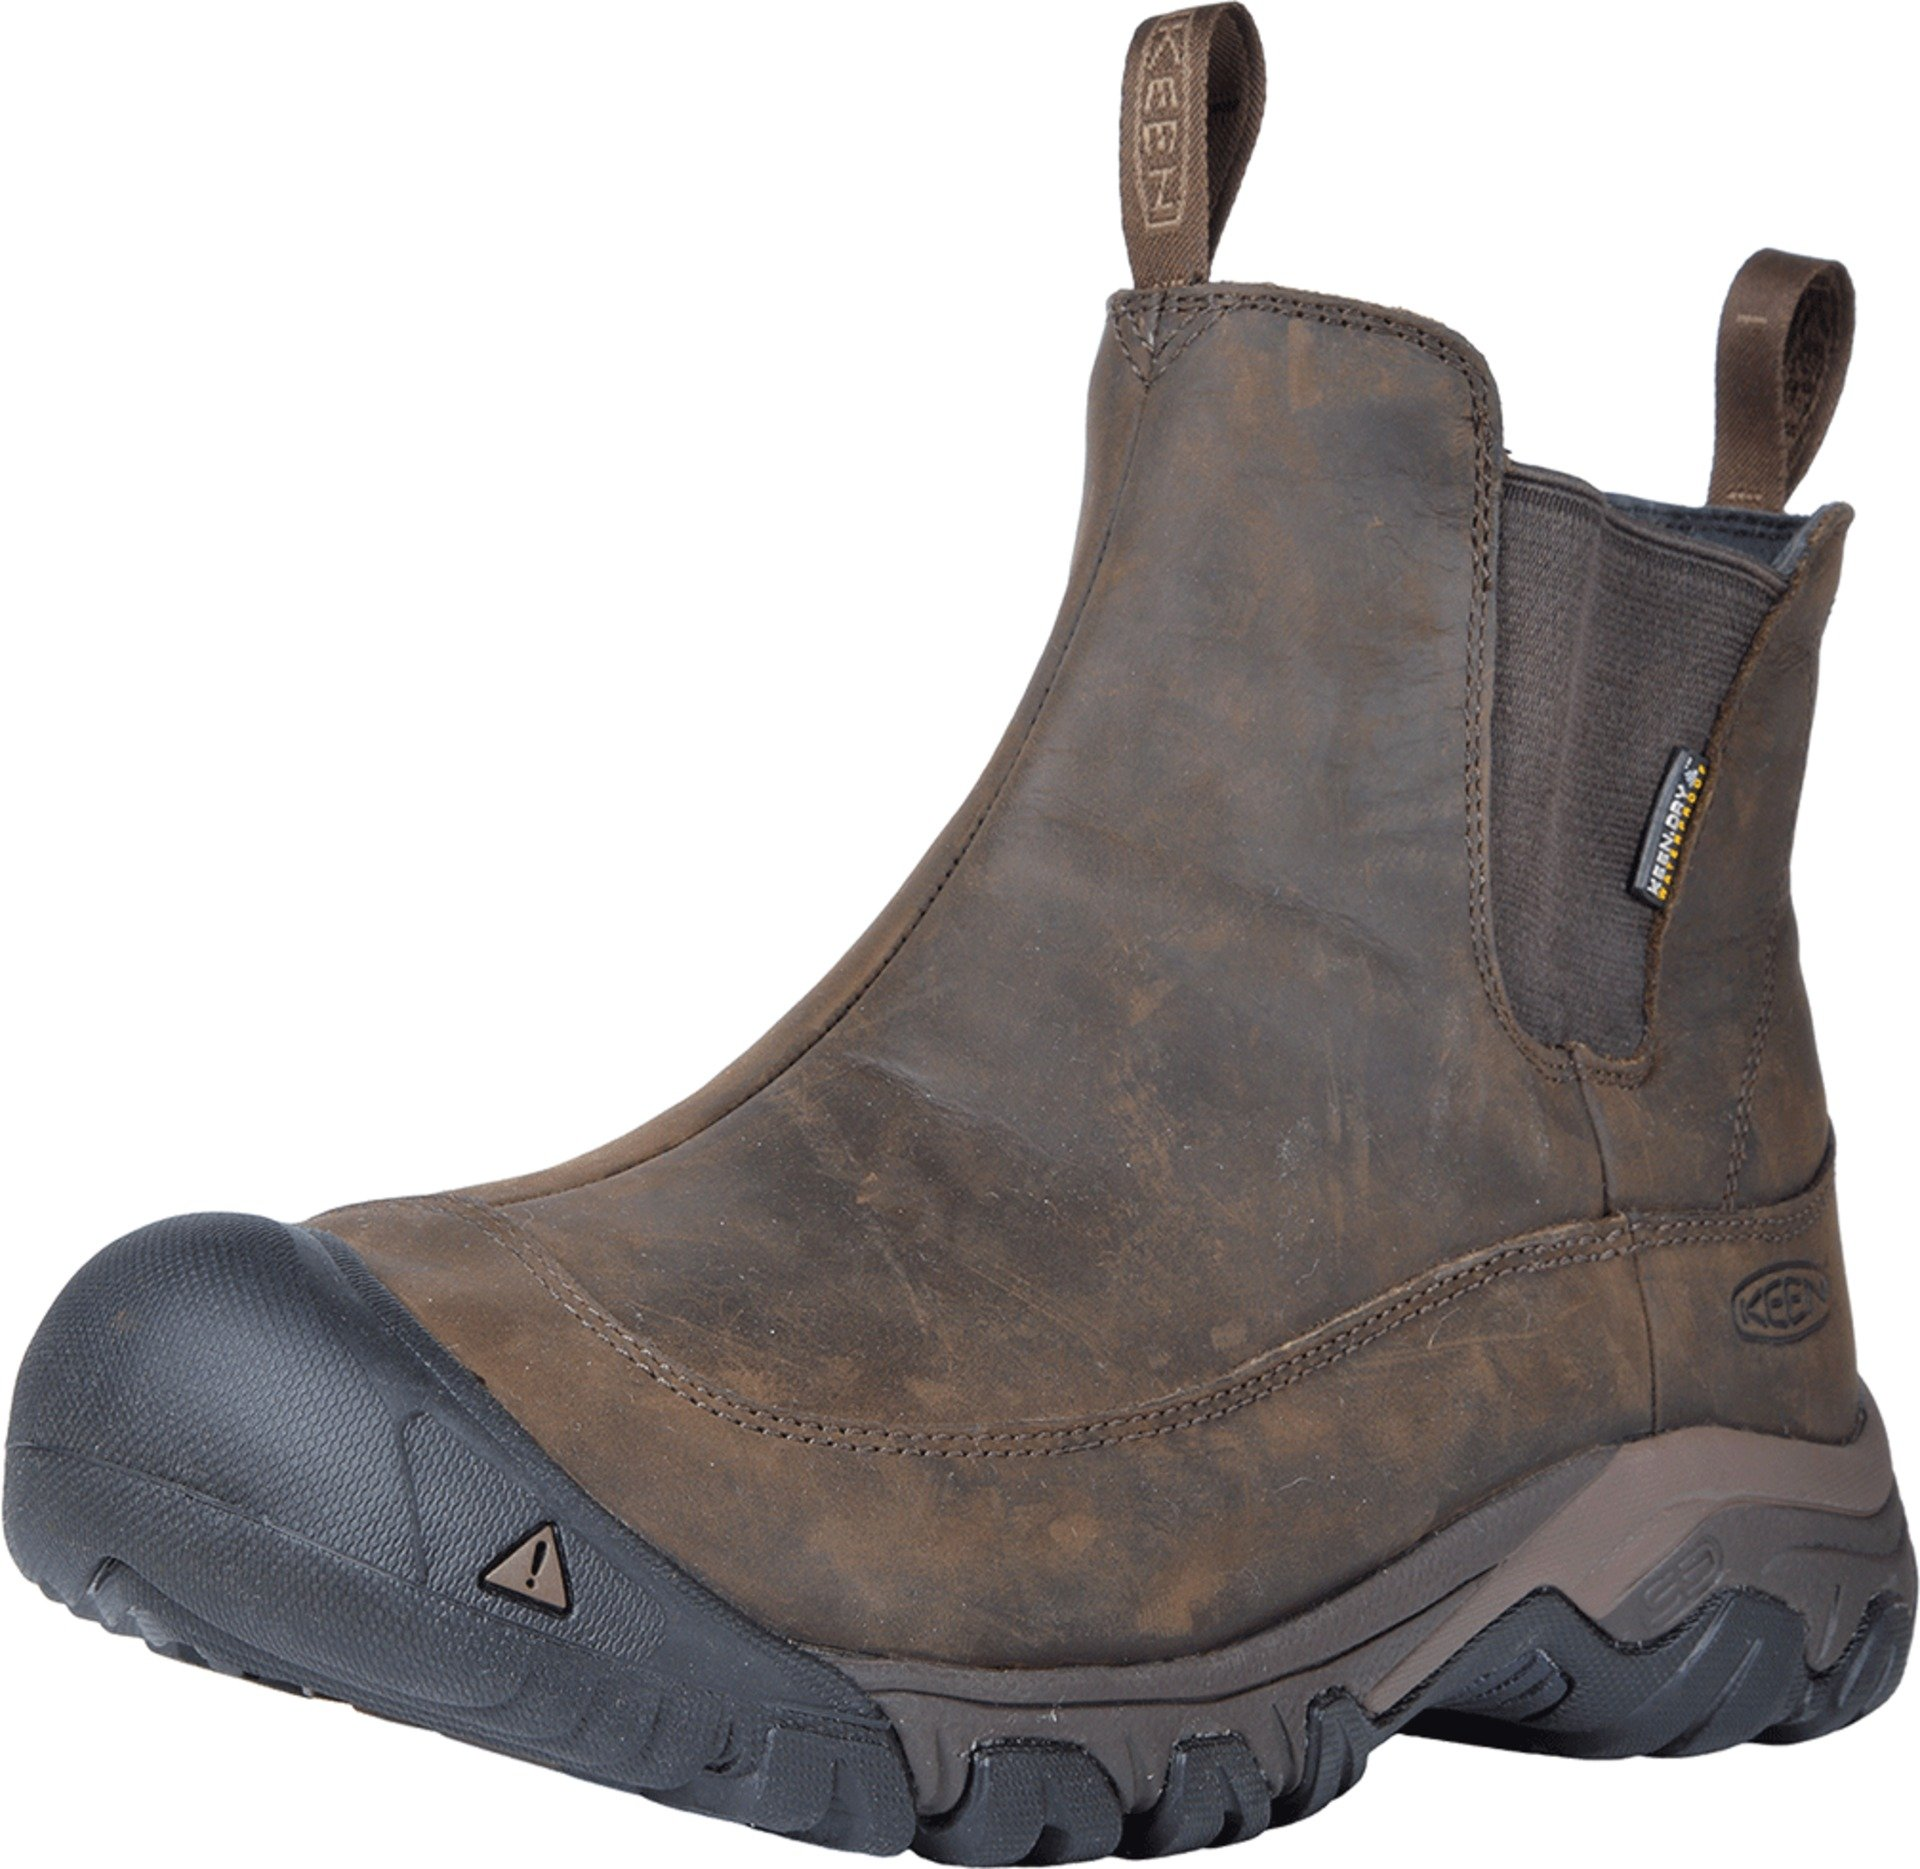 c15fce97bc6 Keen Anchorage Boot III WP, Dark Earth/Mulch, M12